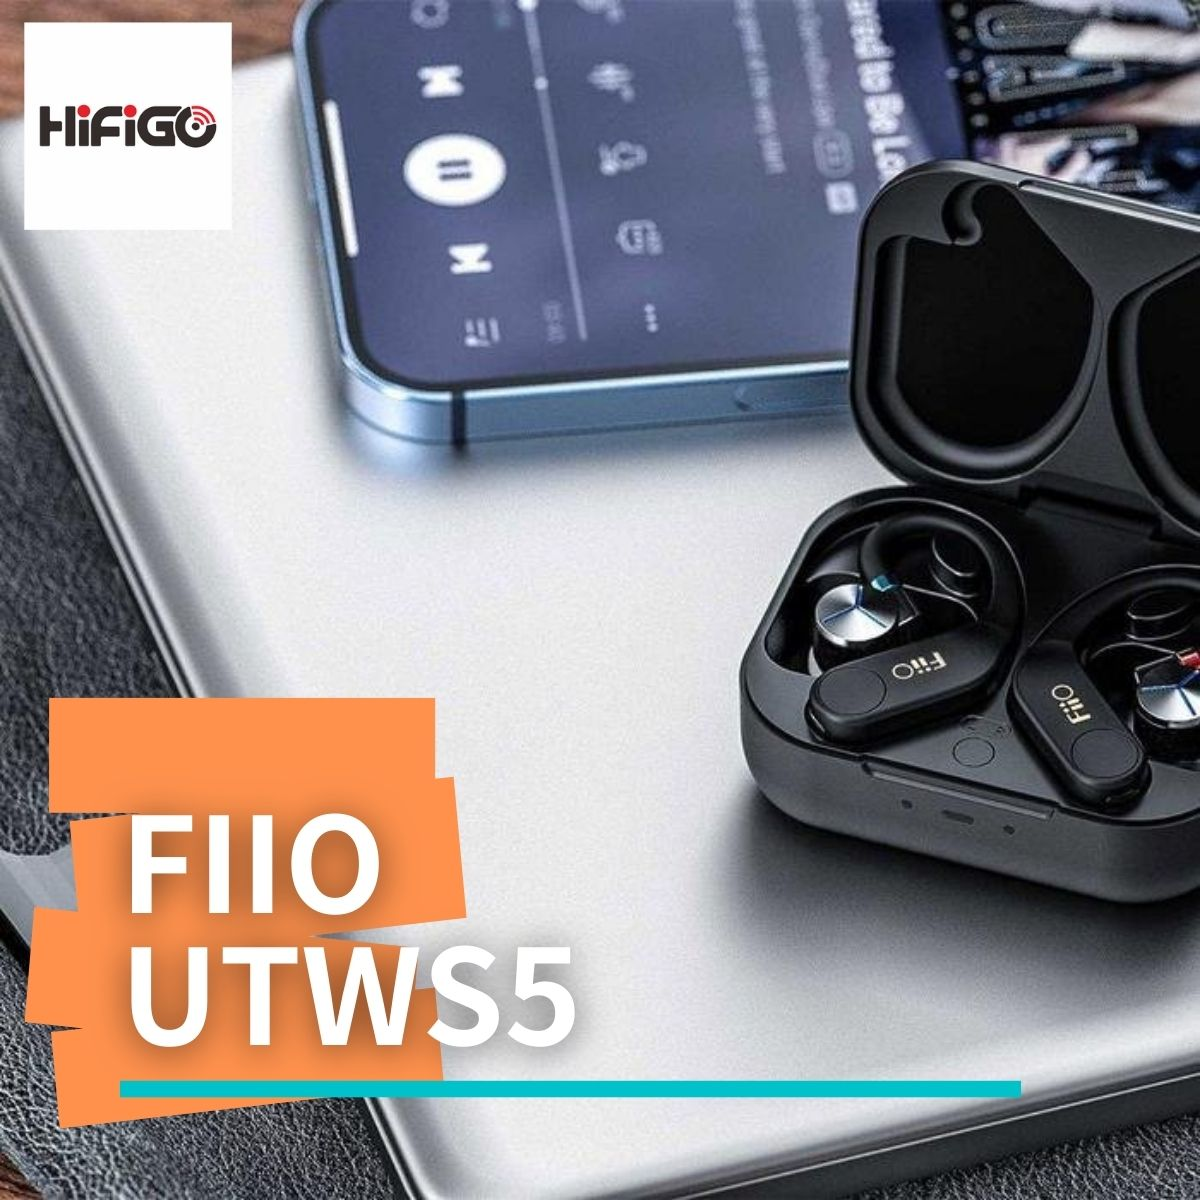 【HiFiGOニュース】FiiO UTWS5:Bluetooth V5.2に対応した完全ワイヤレスアダプター